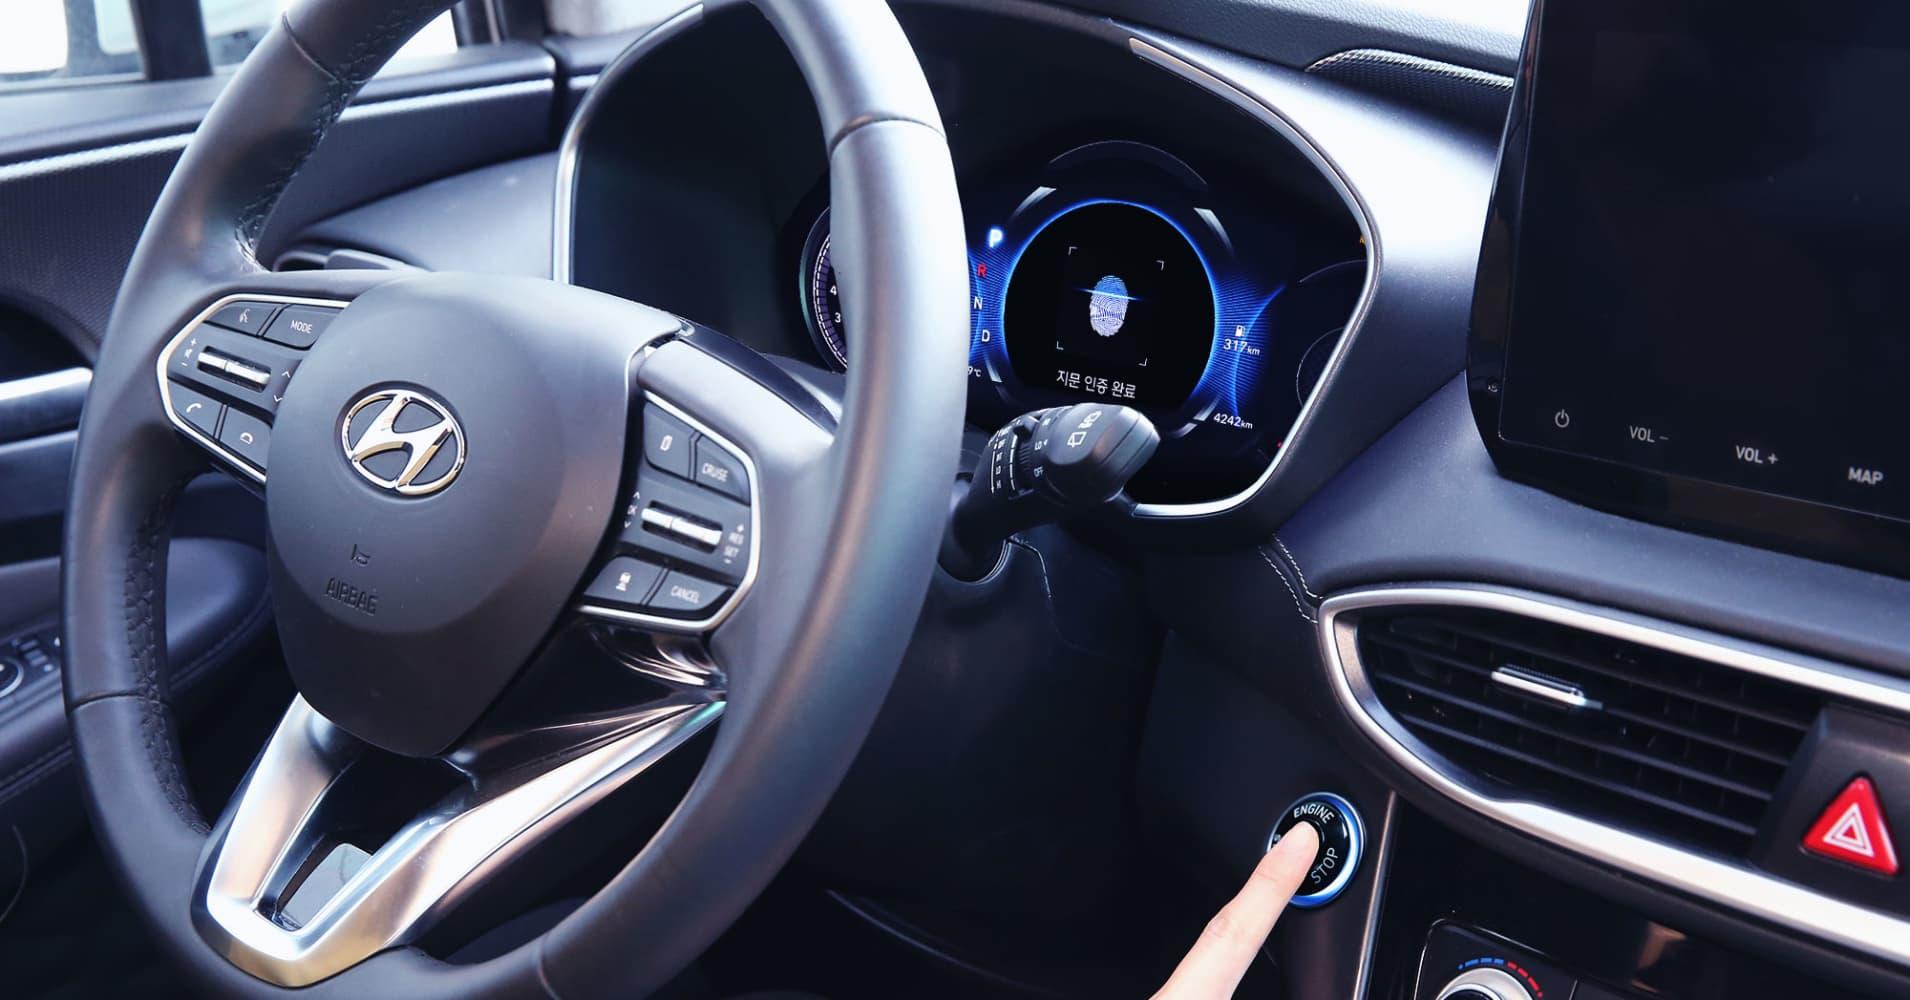 No car keys? No problem. Hyundai rolls out fingerprint technology